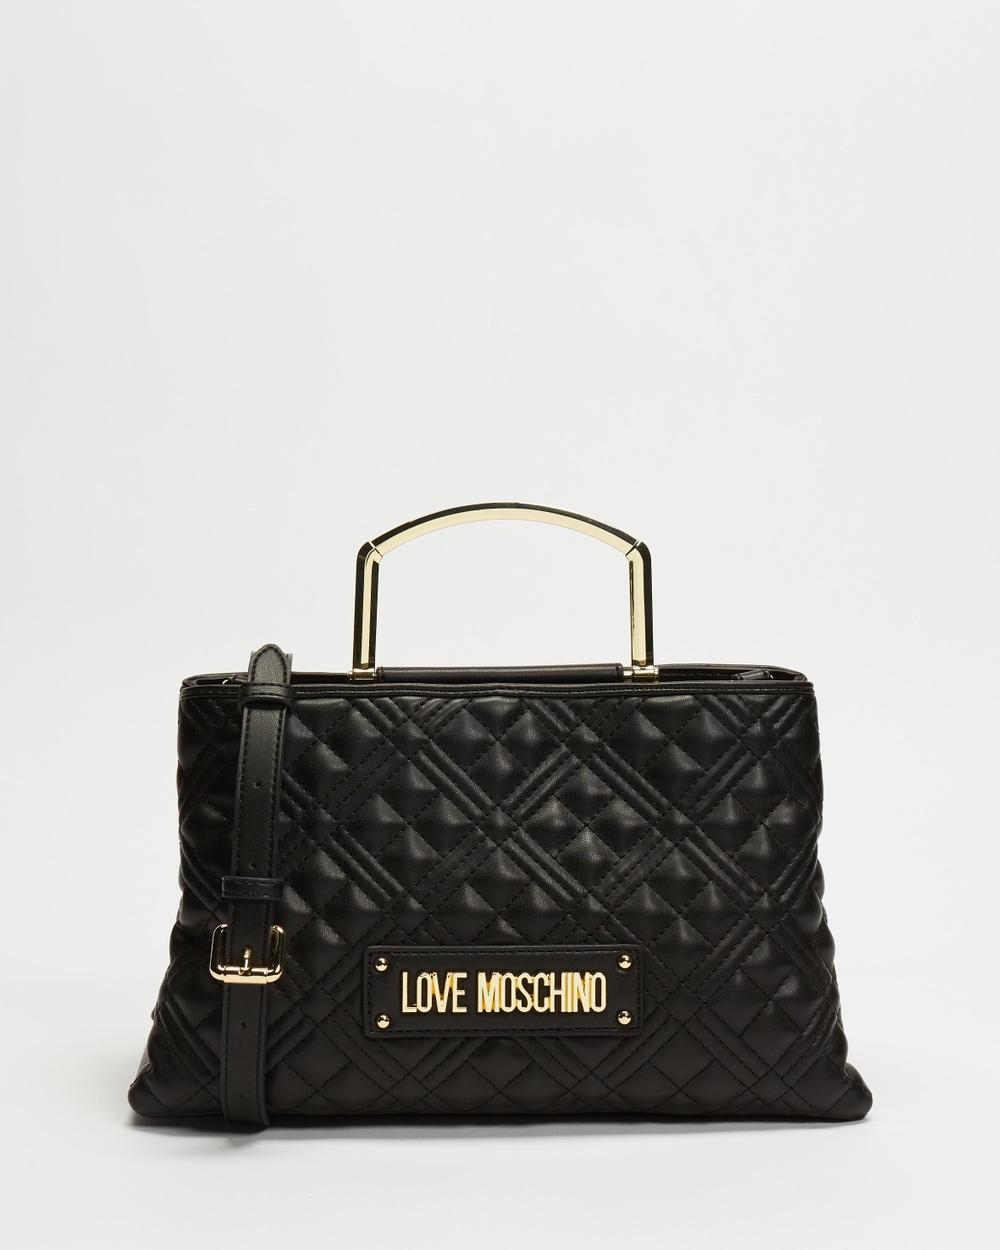 LOVE MOSCHINO Borsa Quilted Nappa Bag Handbags Nero